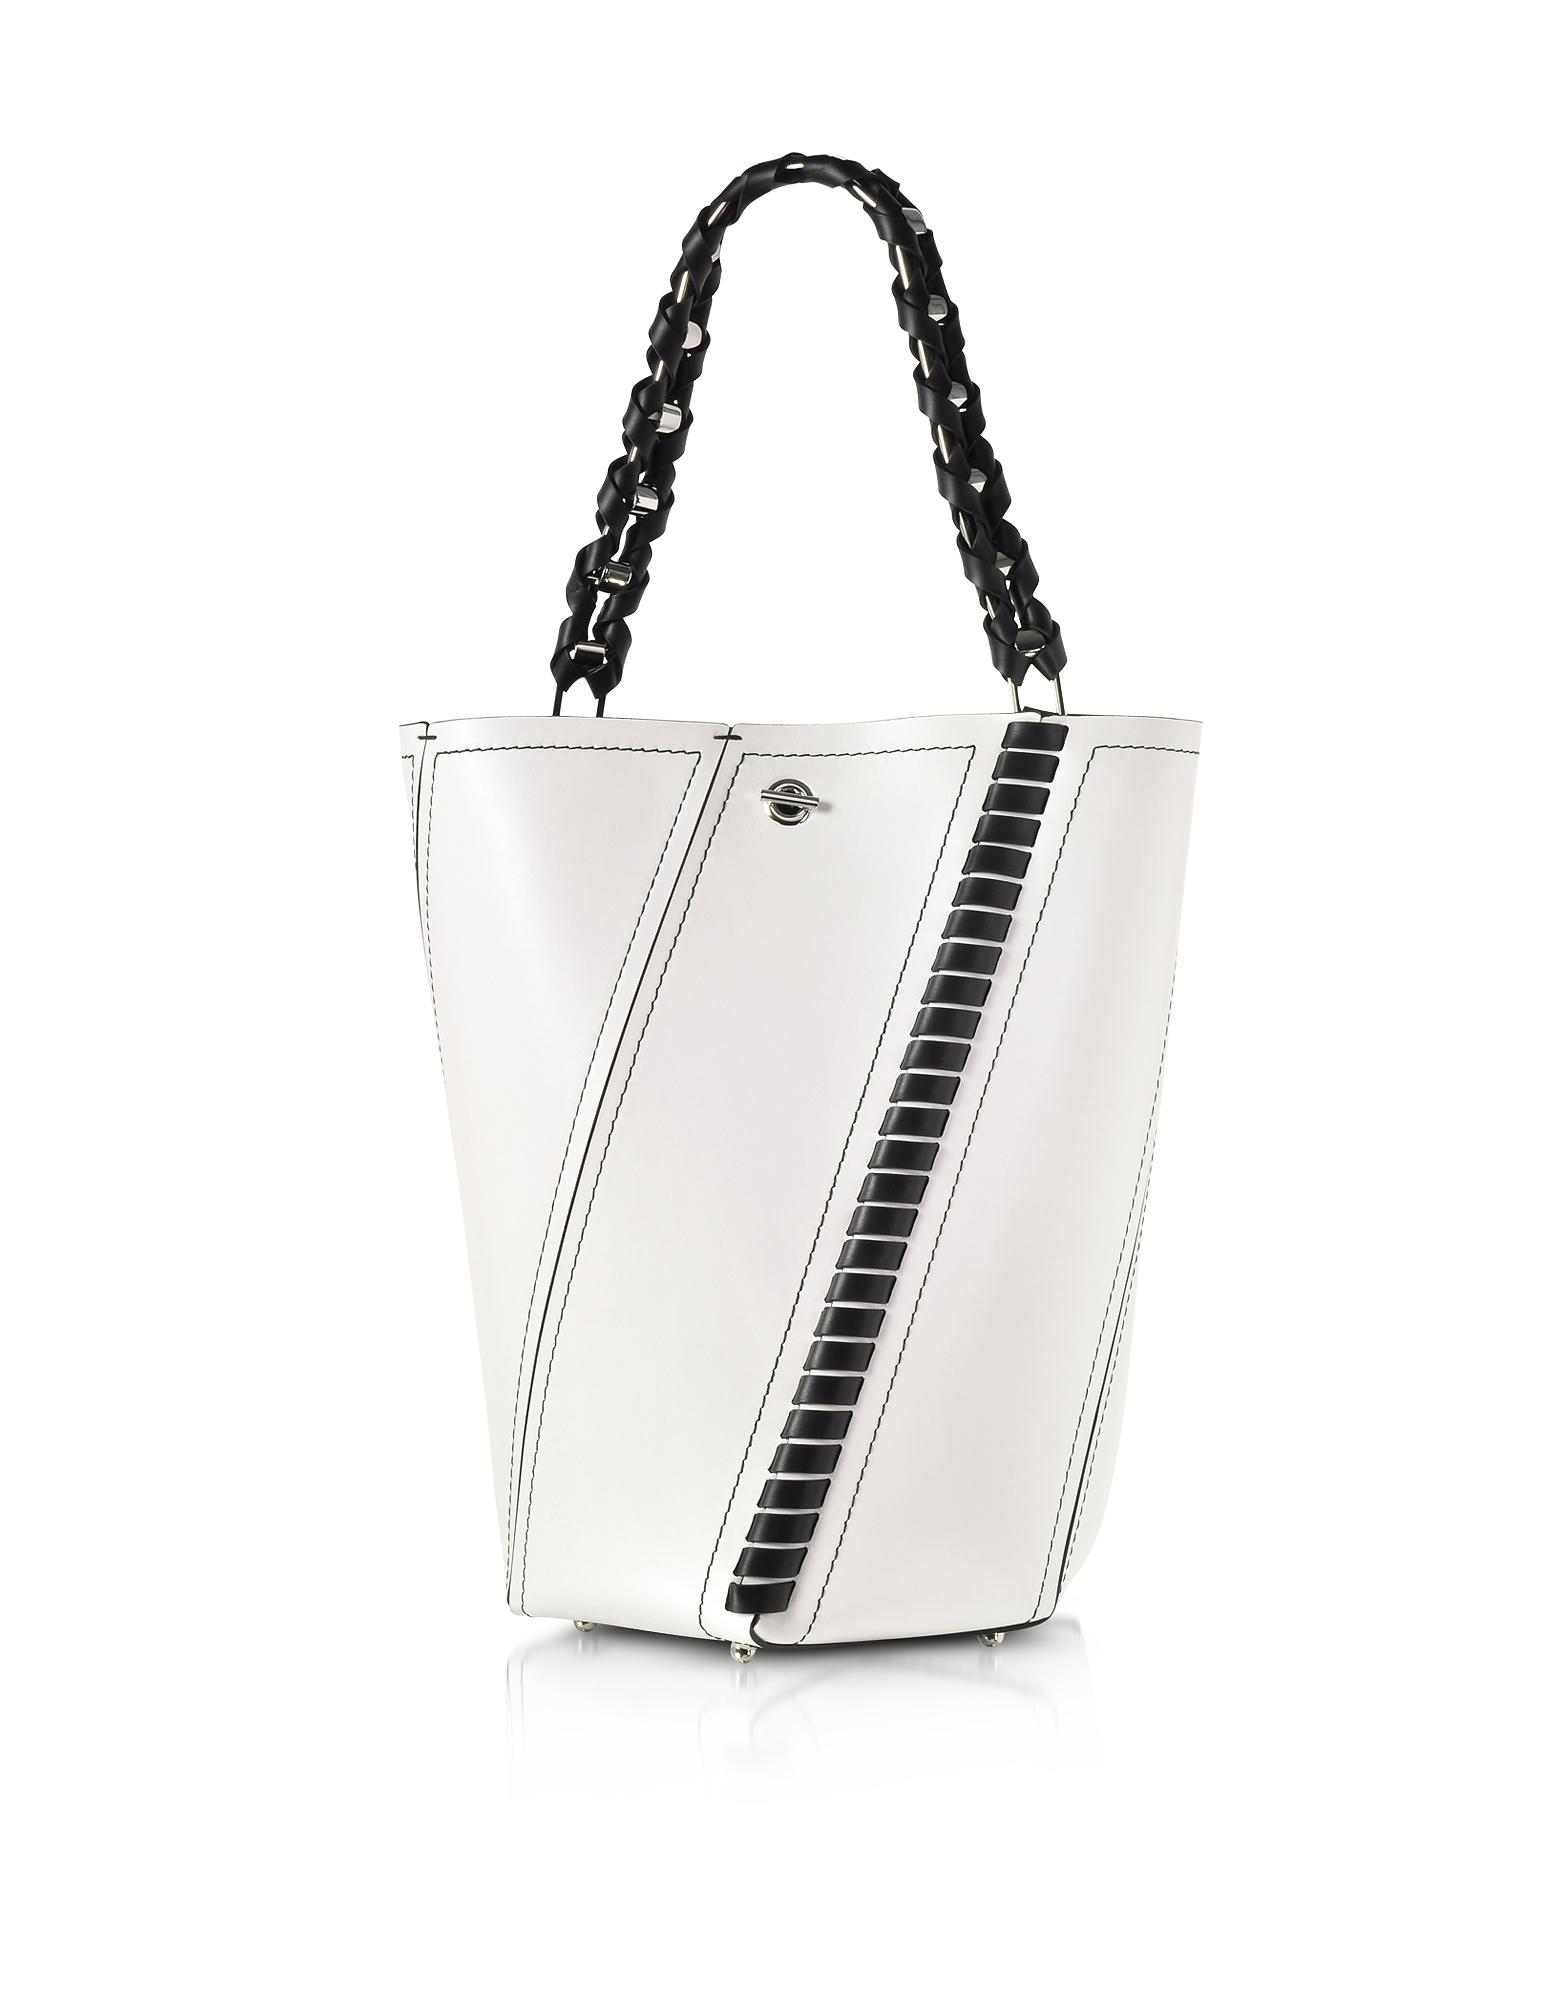 BLACK AND WHITE LEATHER MEDIUM HEX BUCKET BAG W/WHIPSTITCH